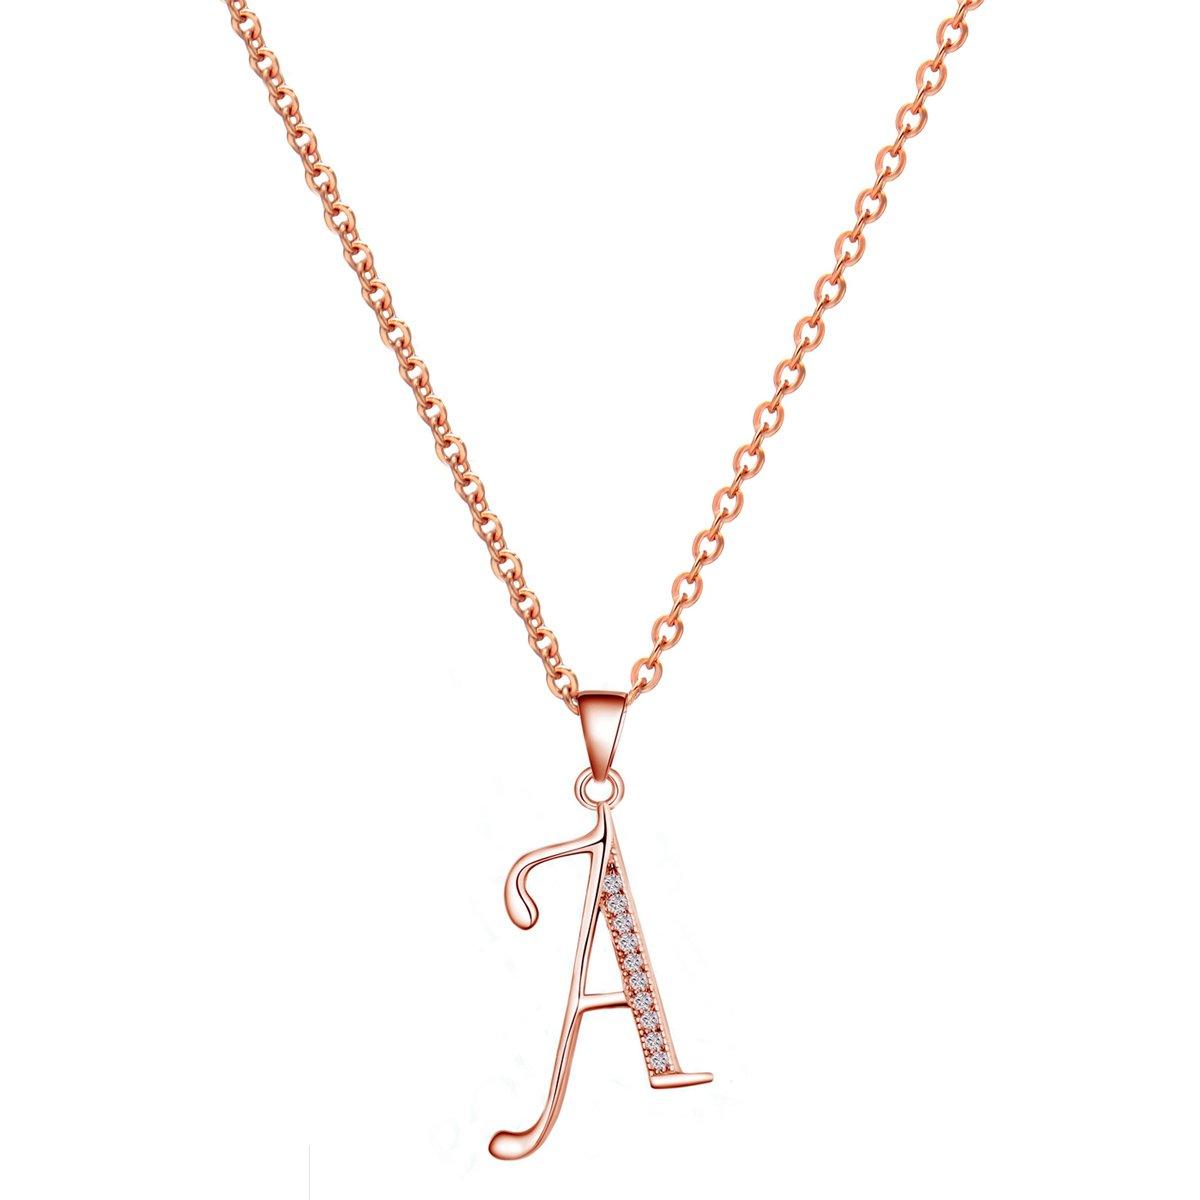 14K Rose Gold Plating Sterling Silver Initial Alphabet Pendant Necklace 18